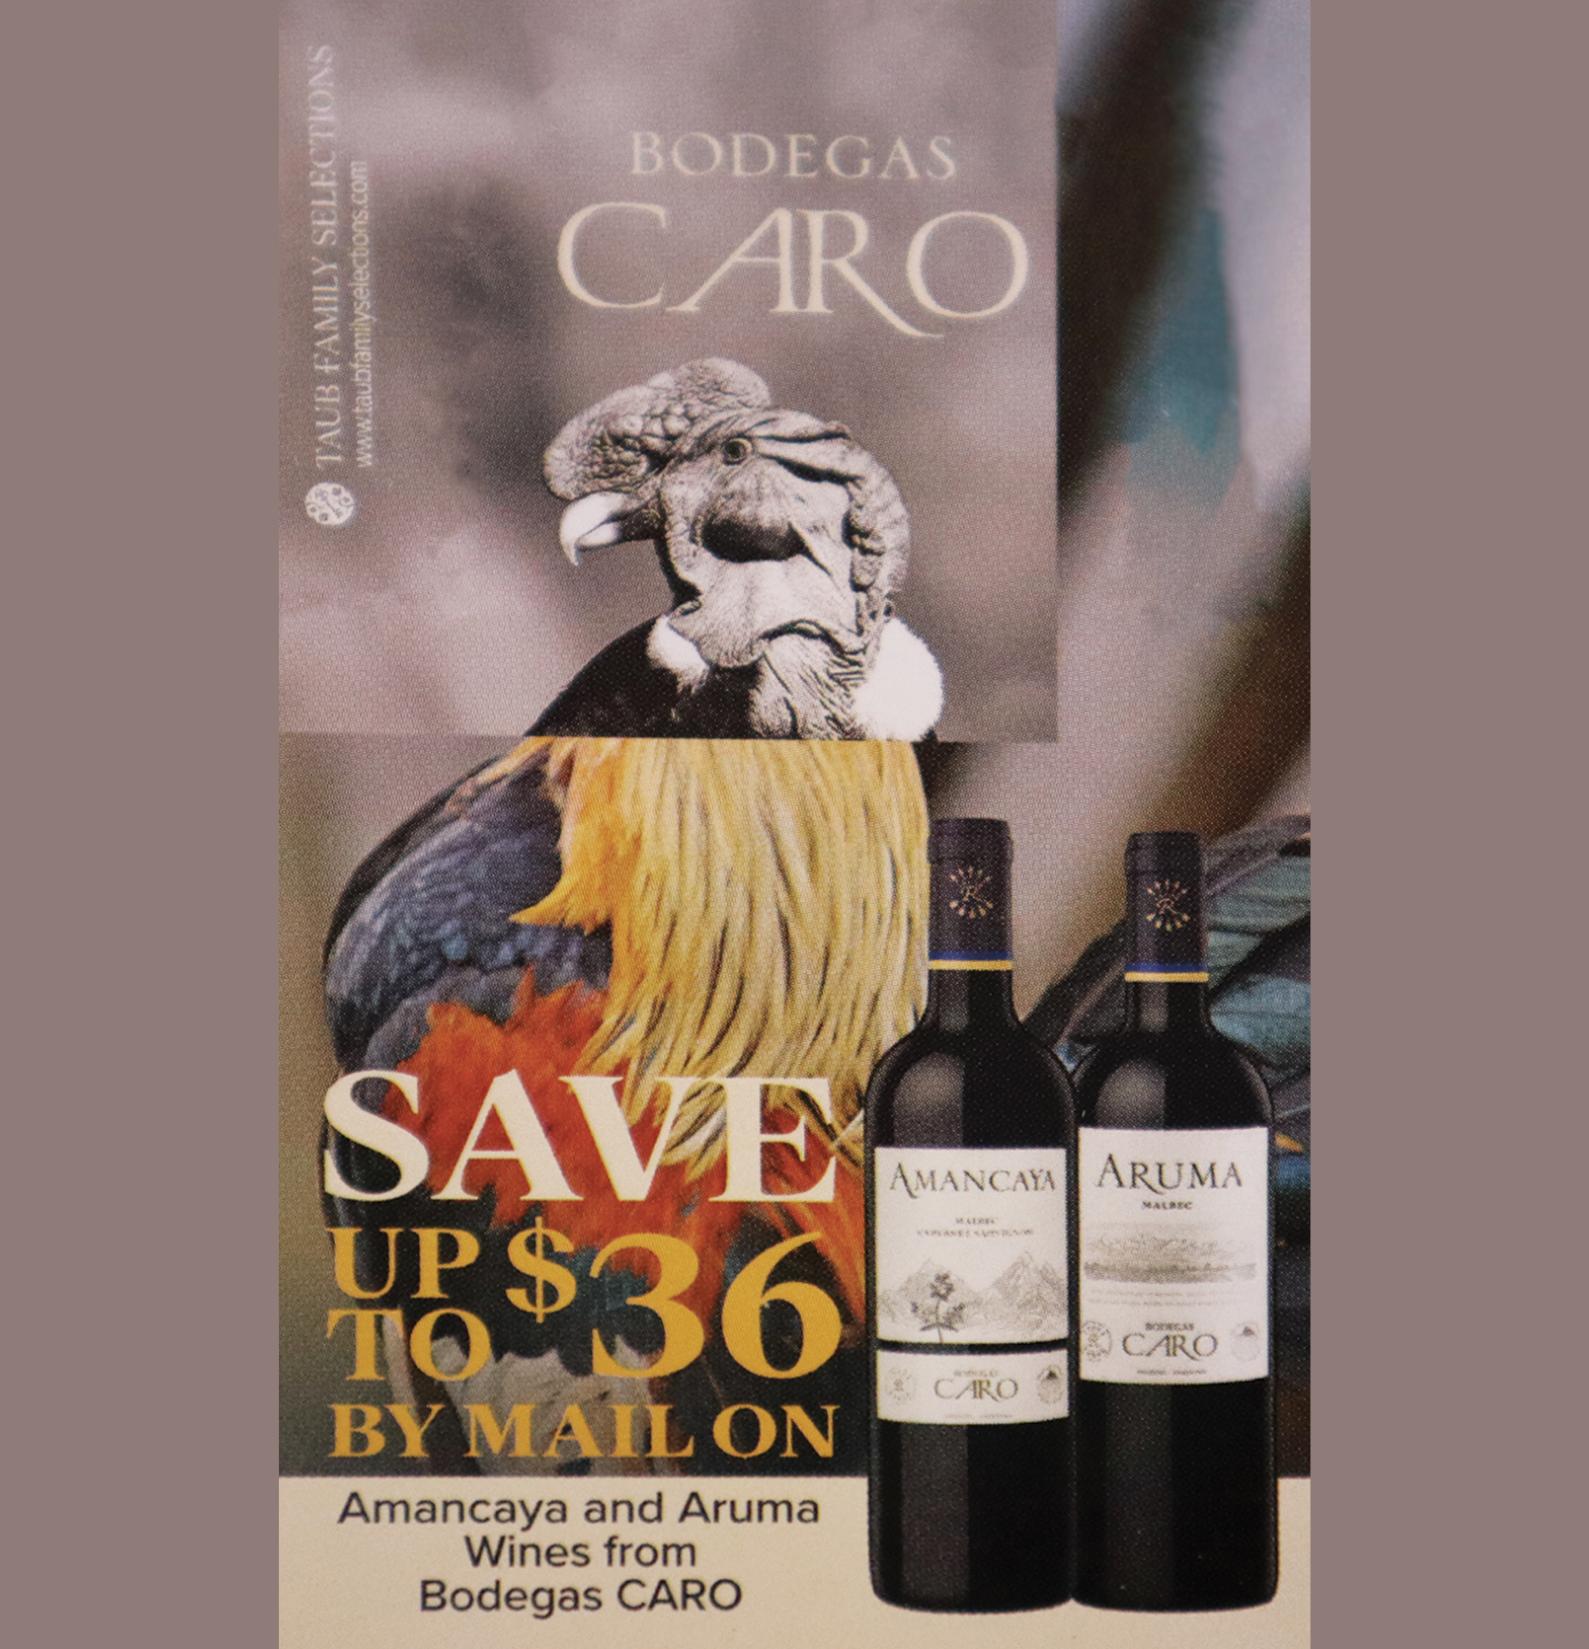 Bodegas Caro Wines